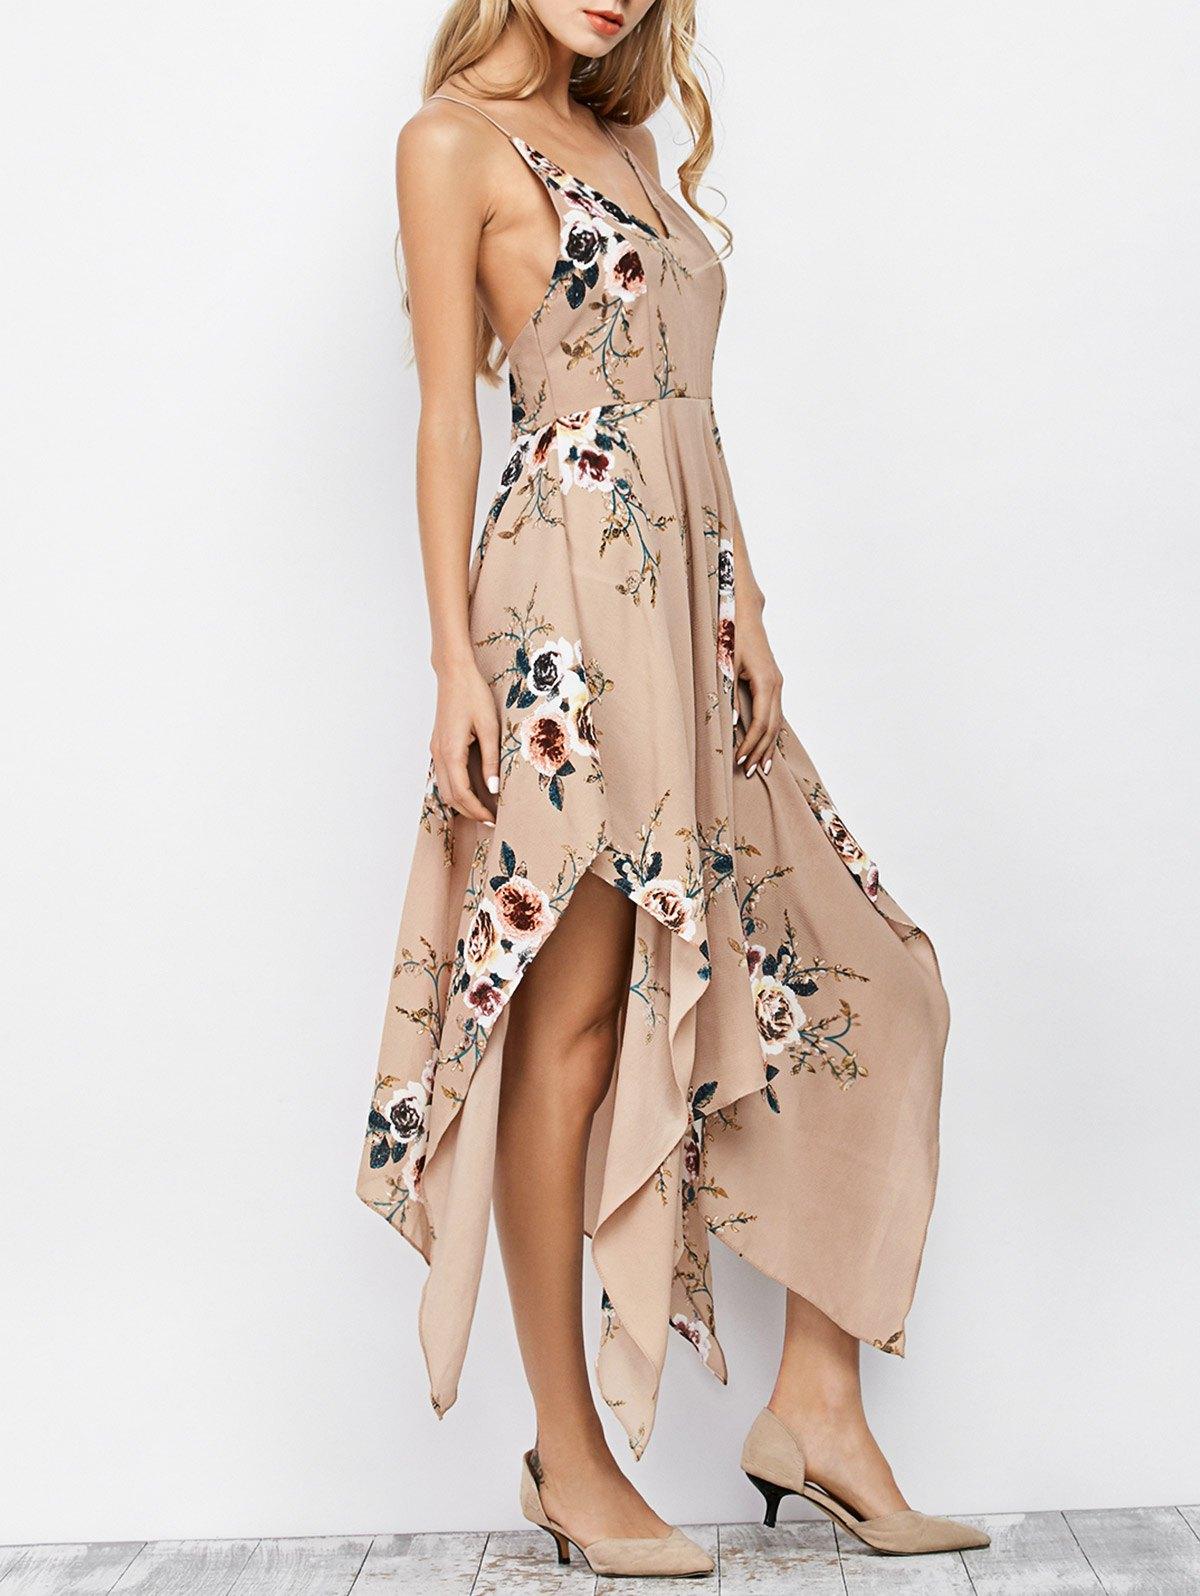 Spaghetti Strap Floral Print Handkerchief Dress